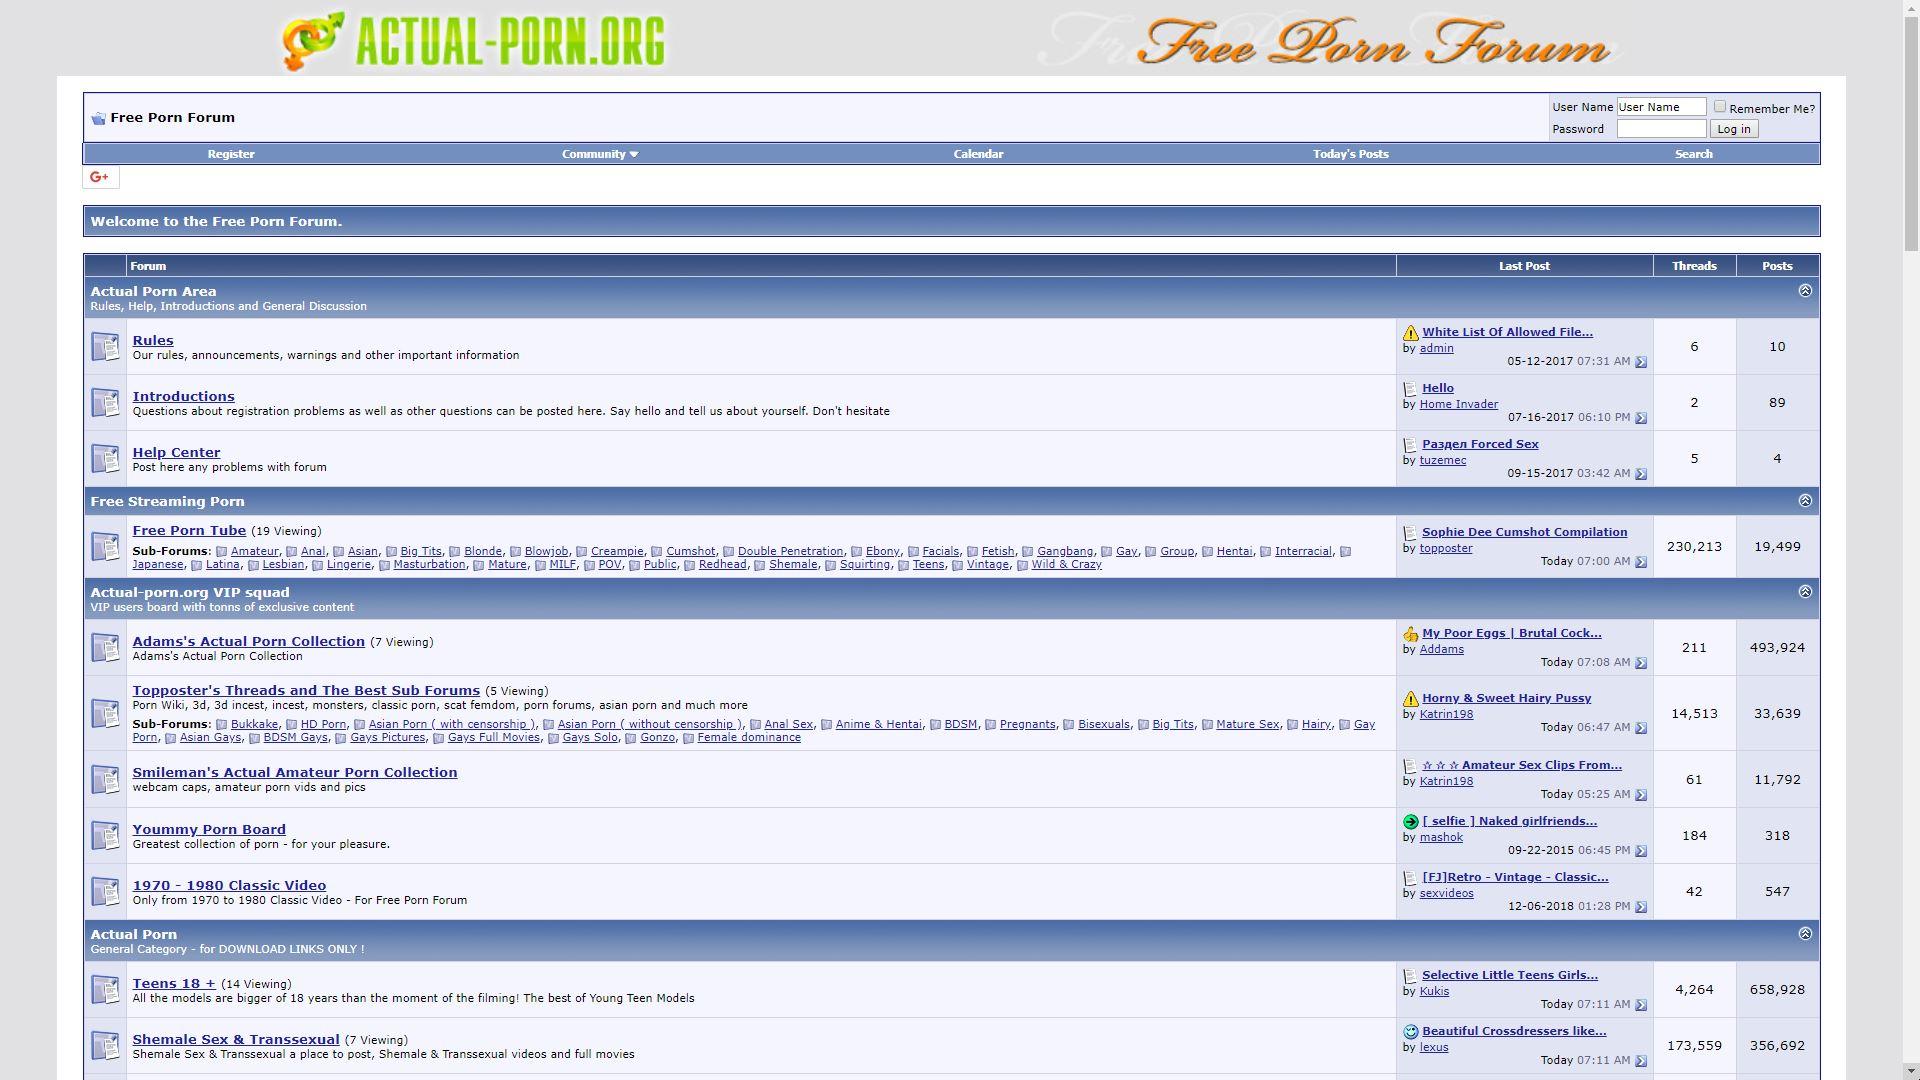 Actual Porn Home Page